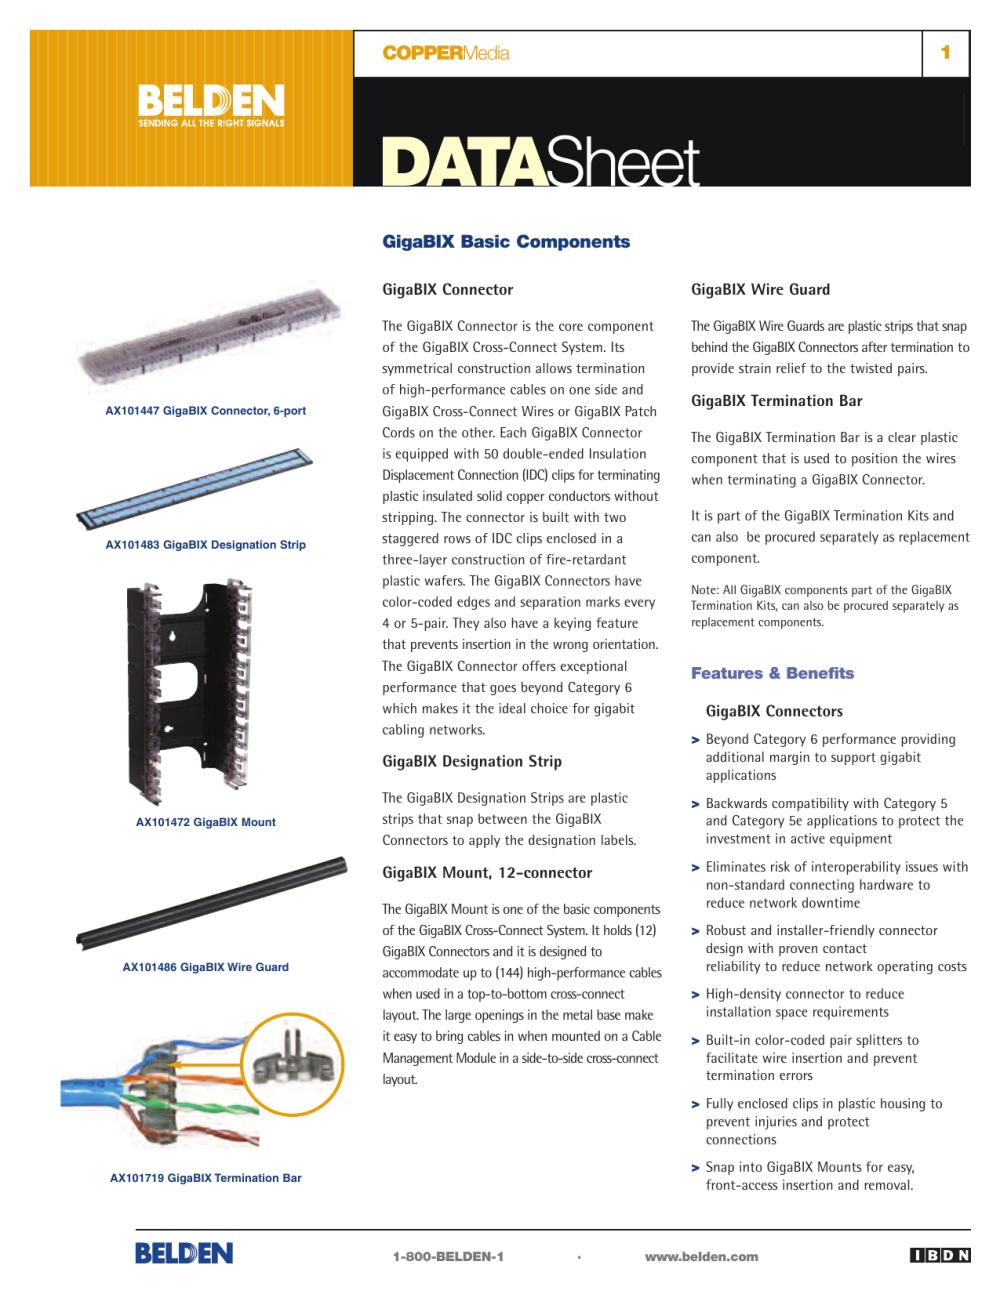 medium resolution of coppermedia gigabix basic components data sheet